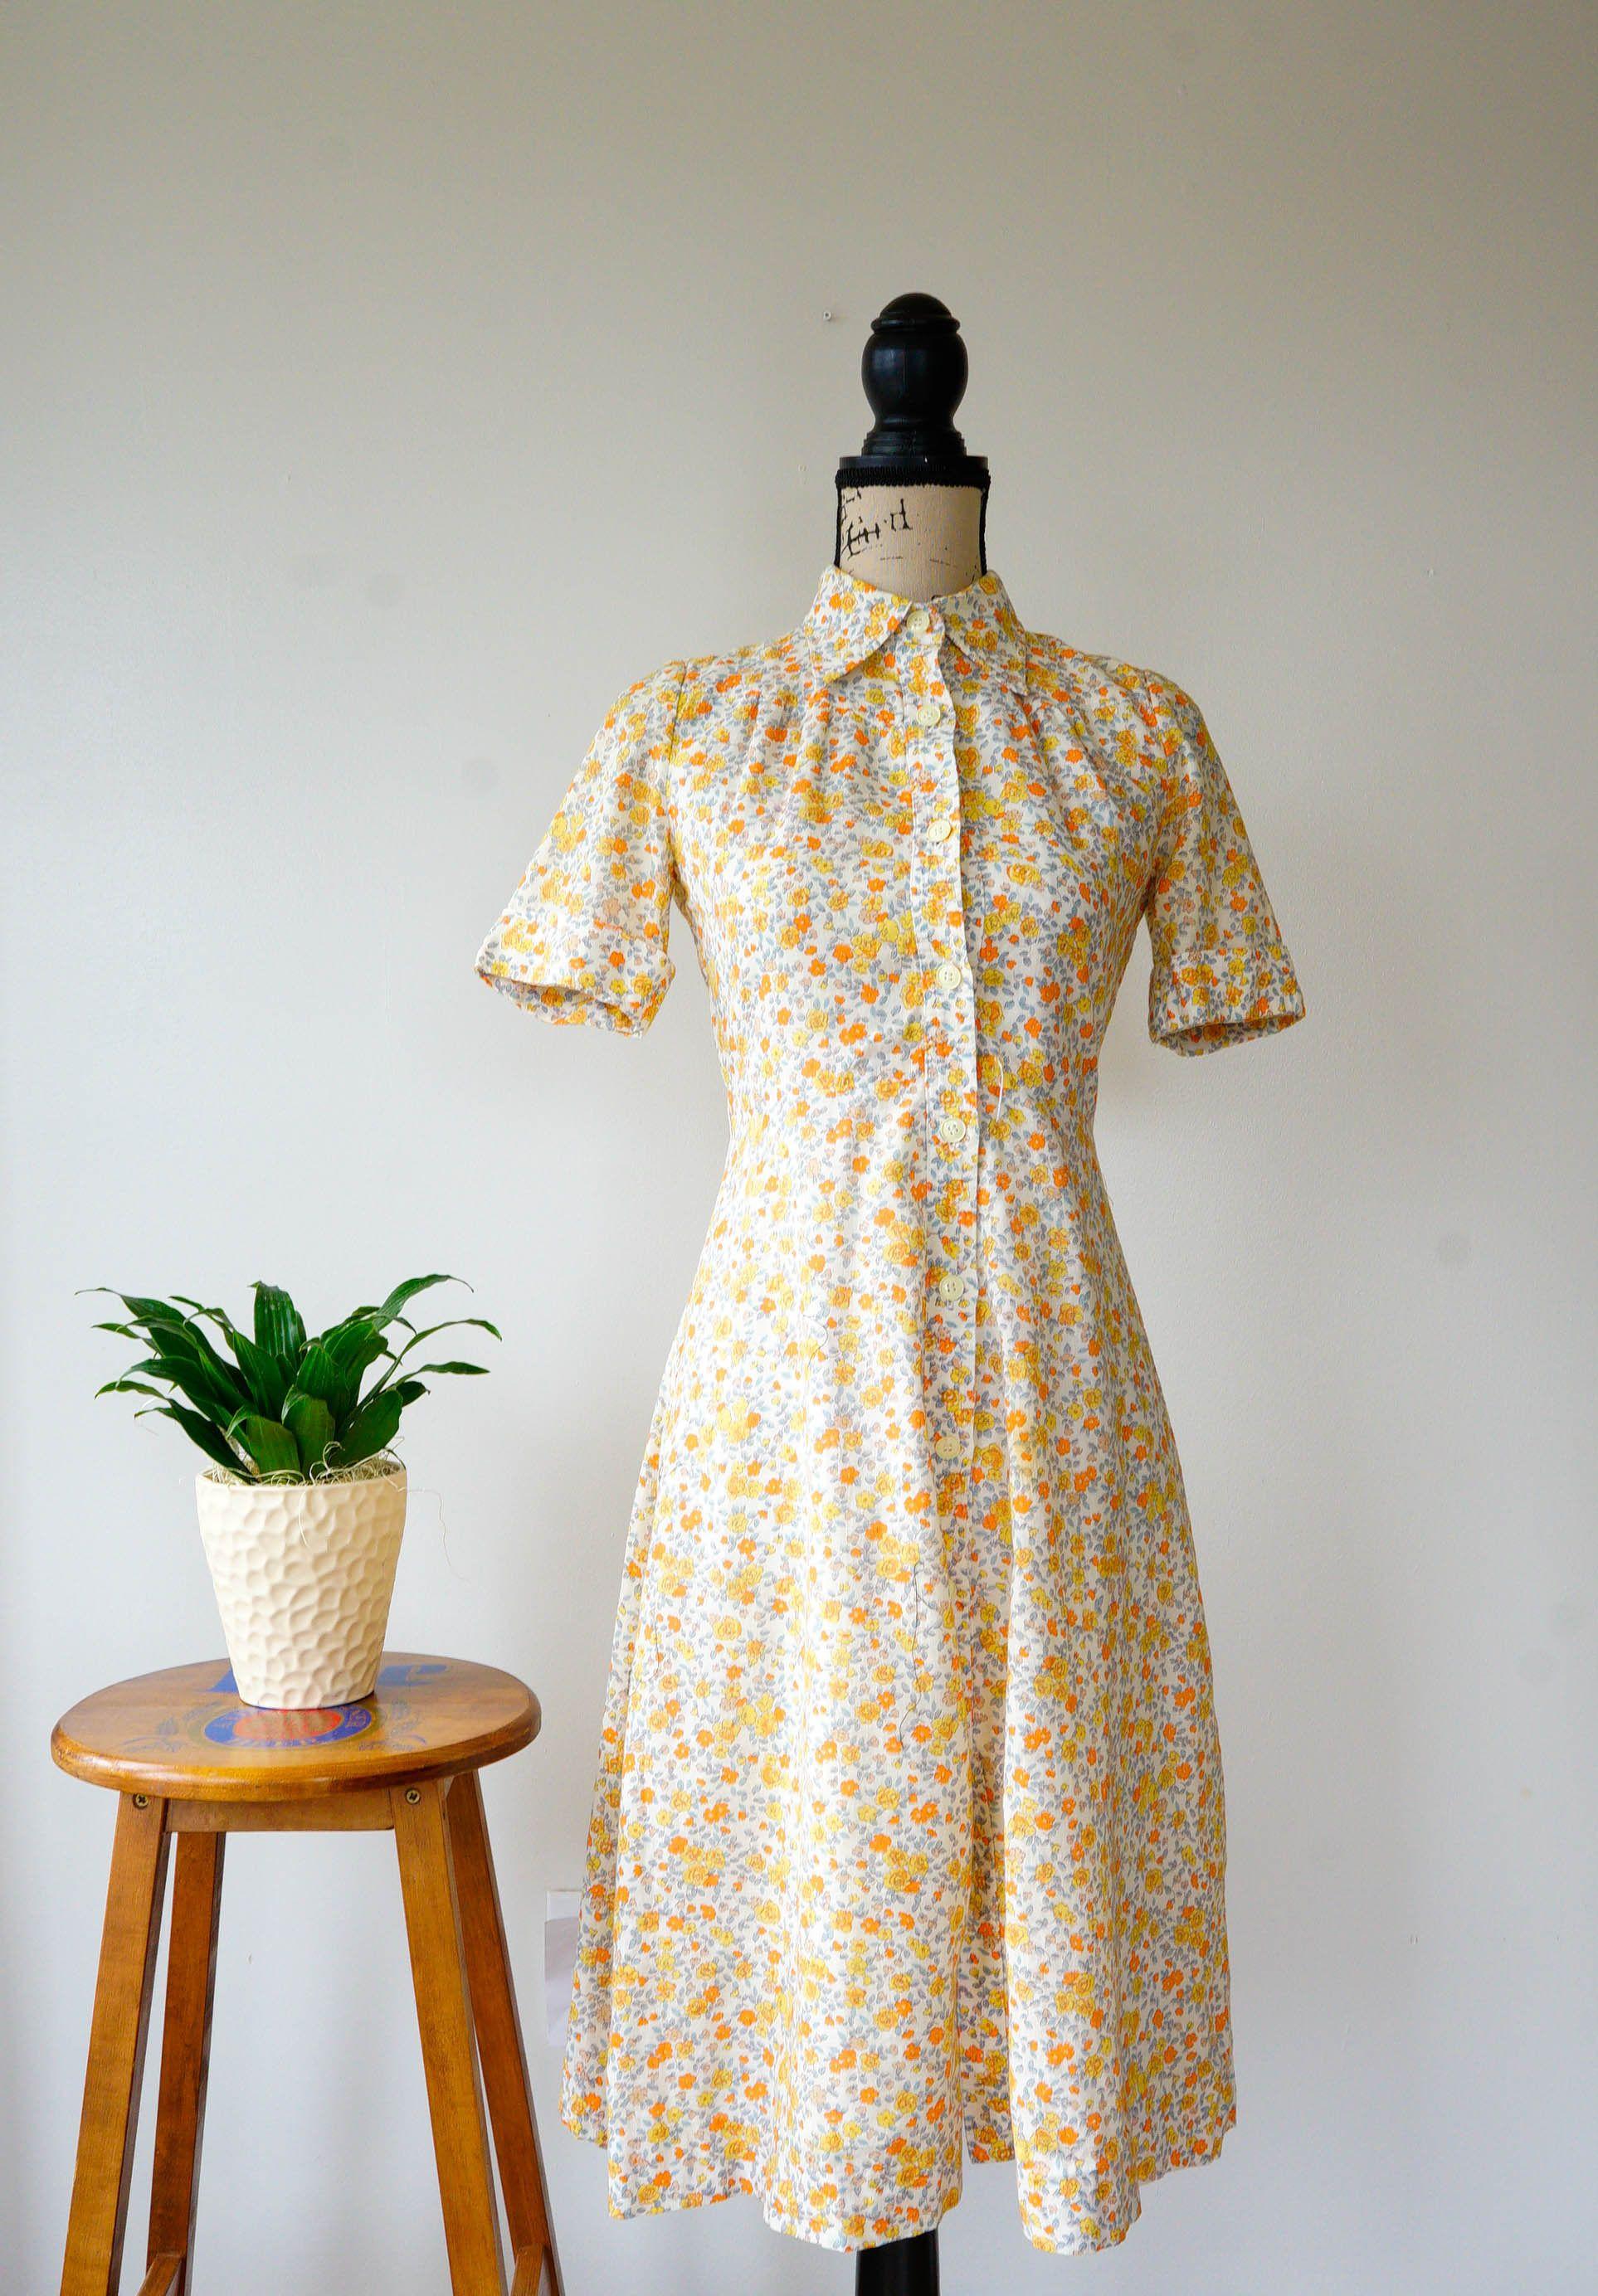 Vintage Dress  Vintage Girls Dress  Black Yellow Green Flowers Floral Dress  Hand Sewn Dress  1970s 70s  Medium M Large L